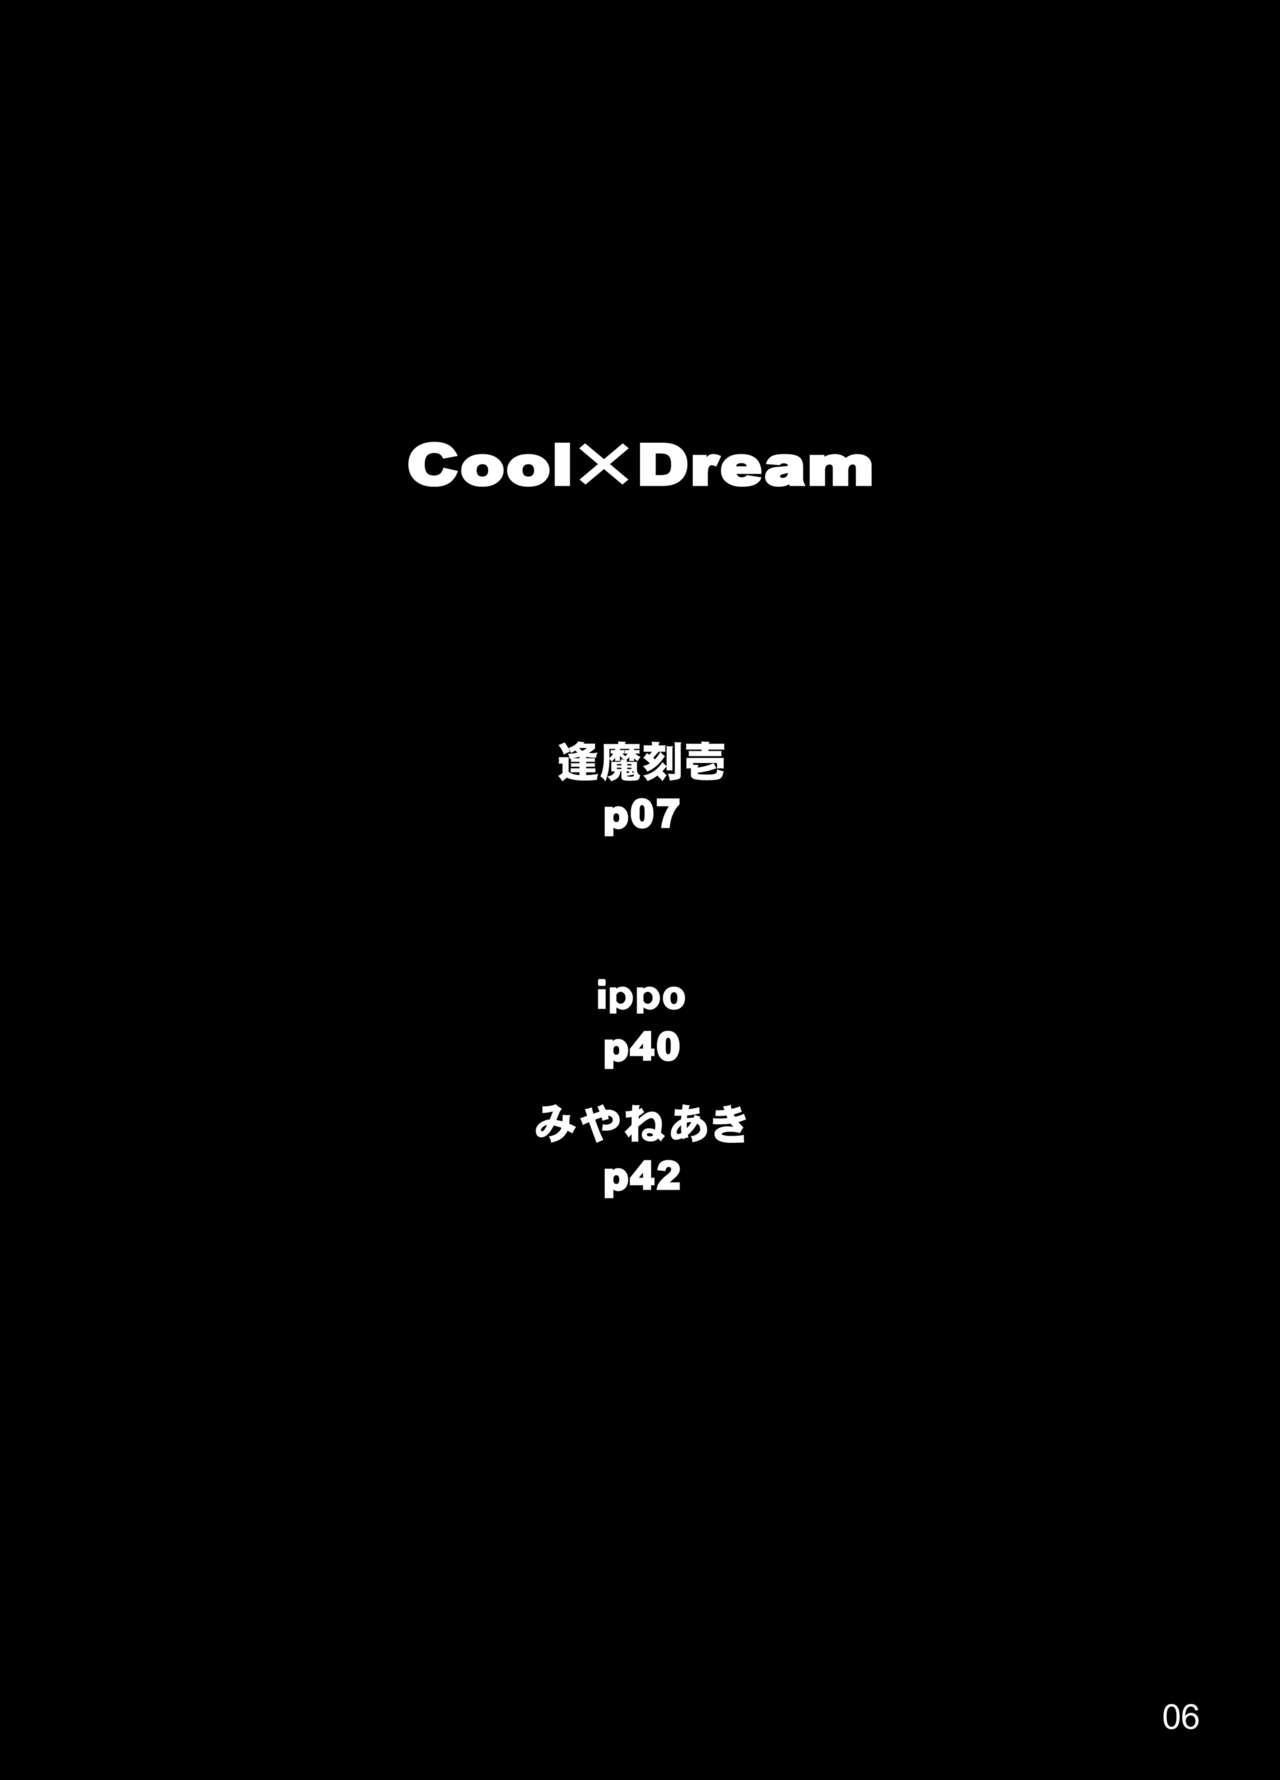 Cool×Dream 3